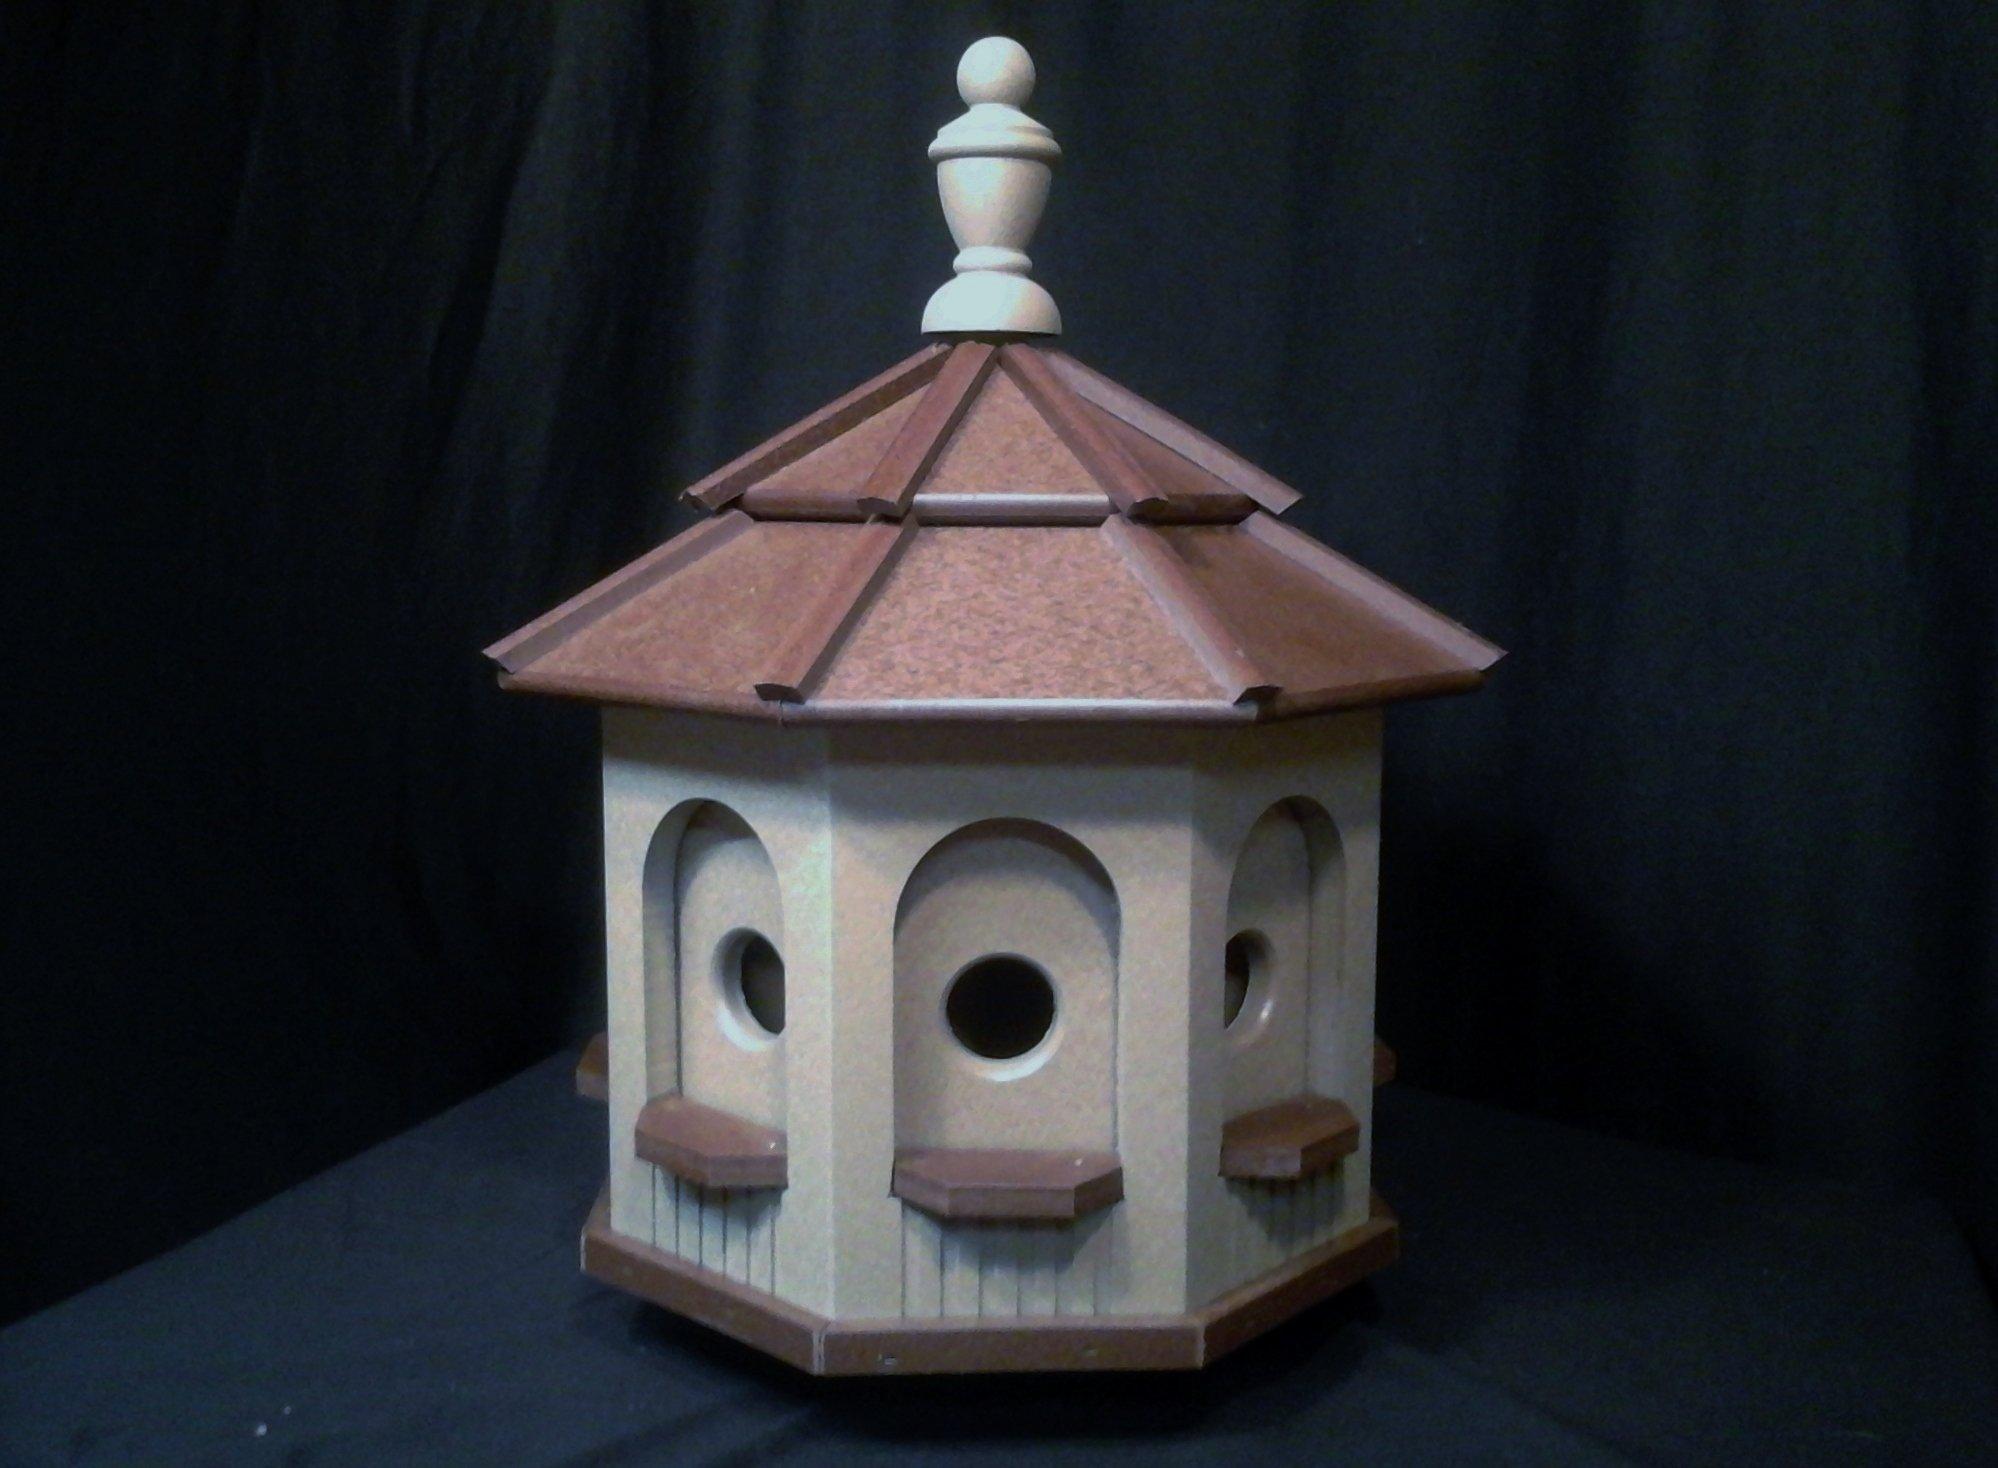 Medium Octagon Vinyl Birdhouse Amish Homemade Handmade Handcrafted Clay & Brown